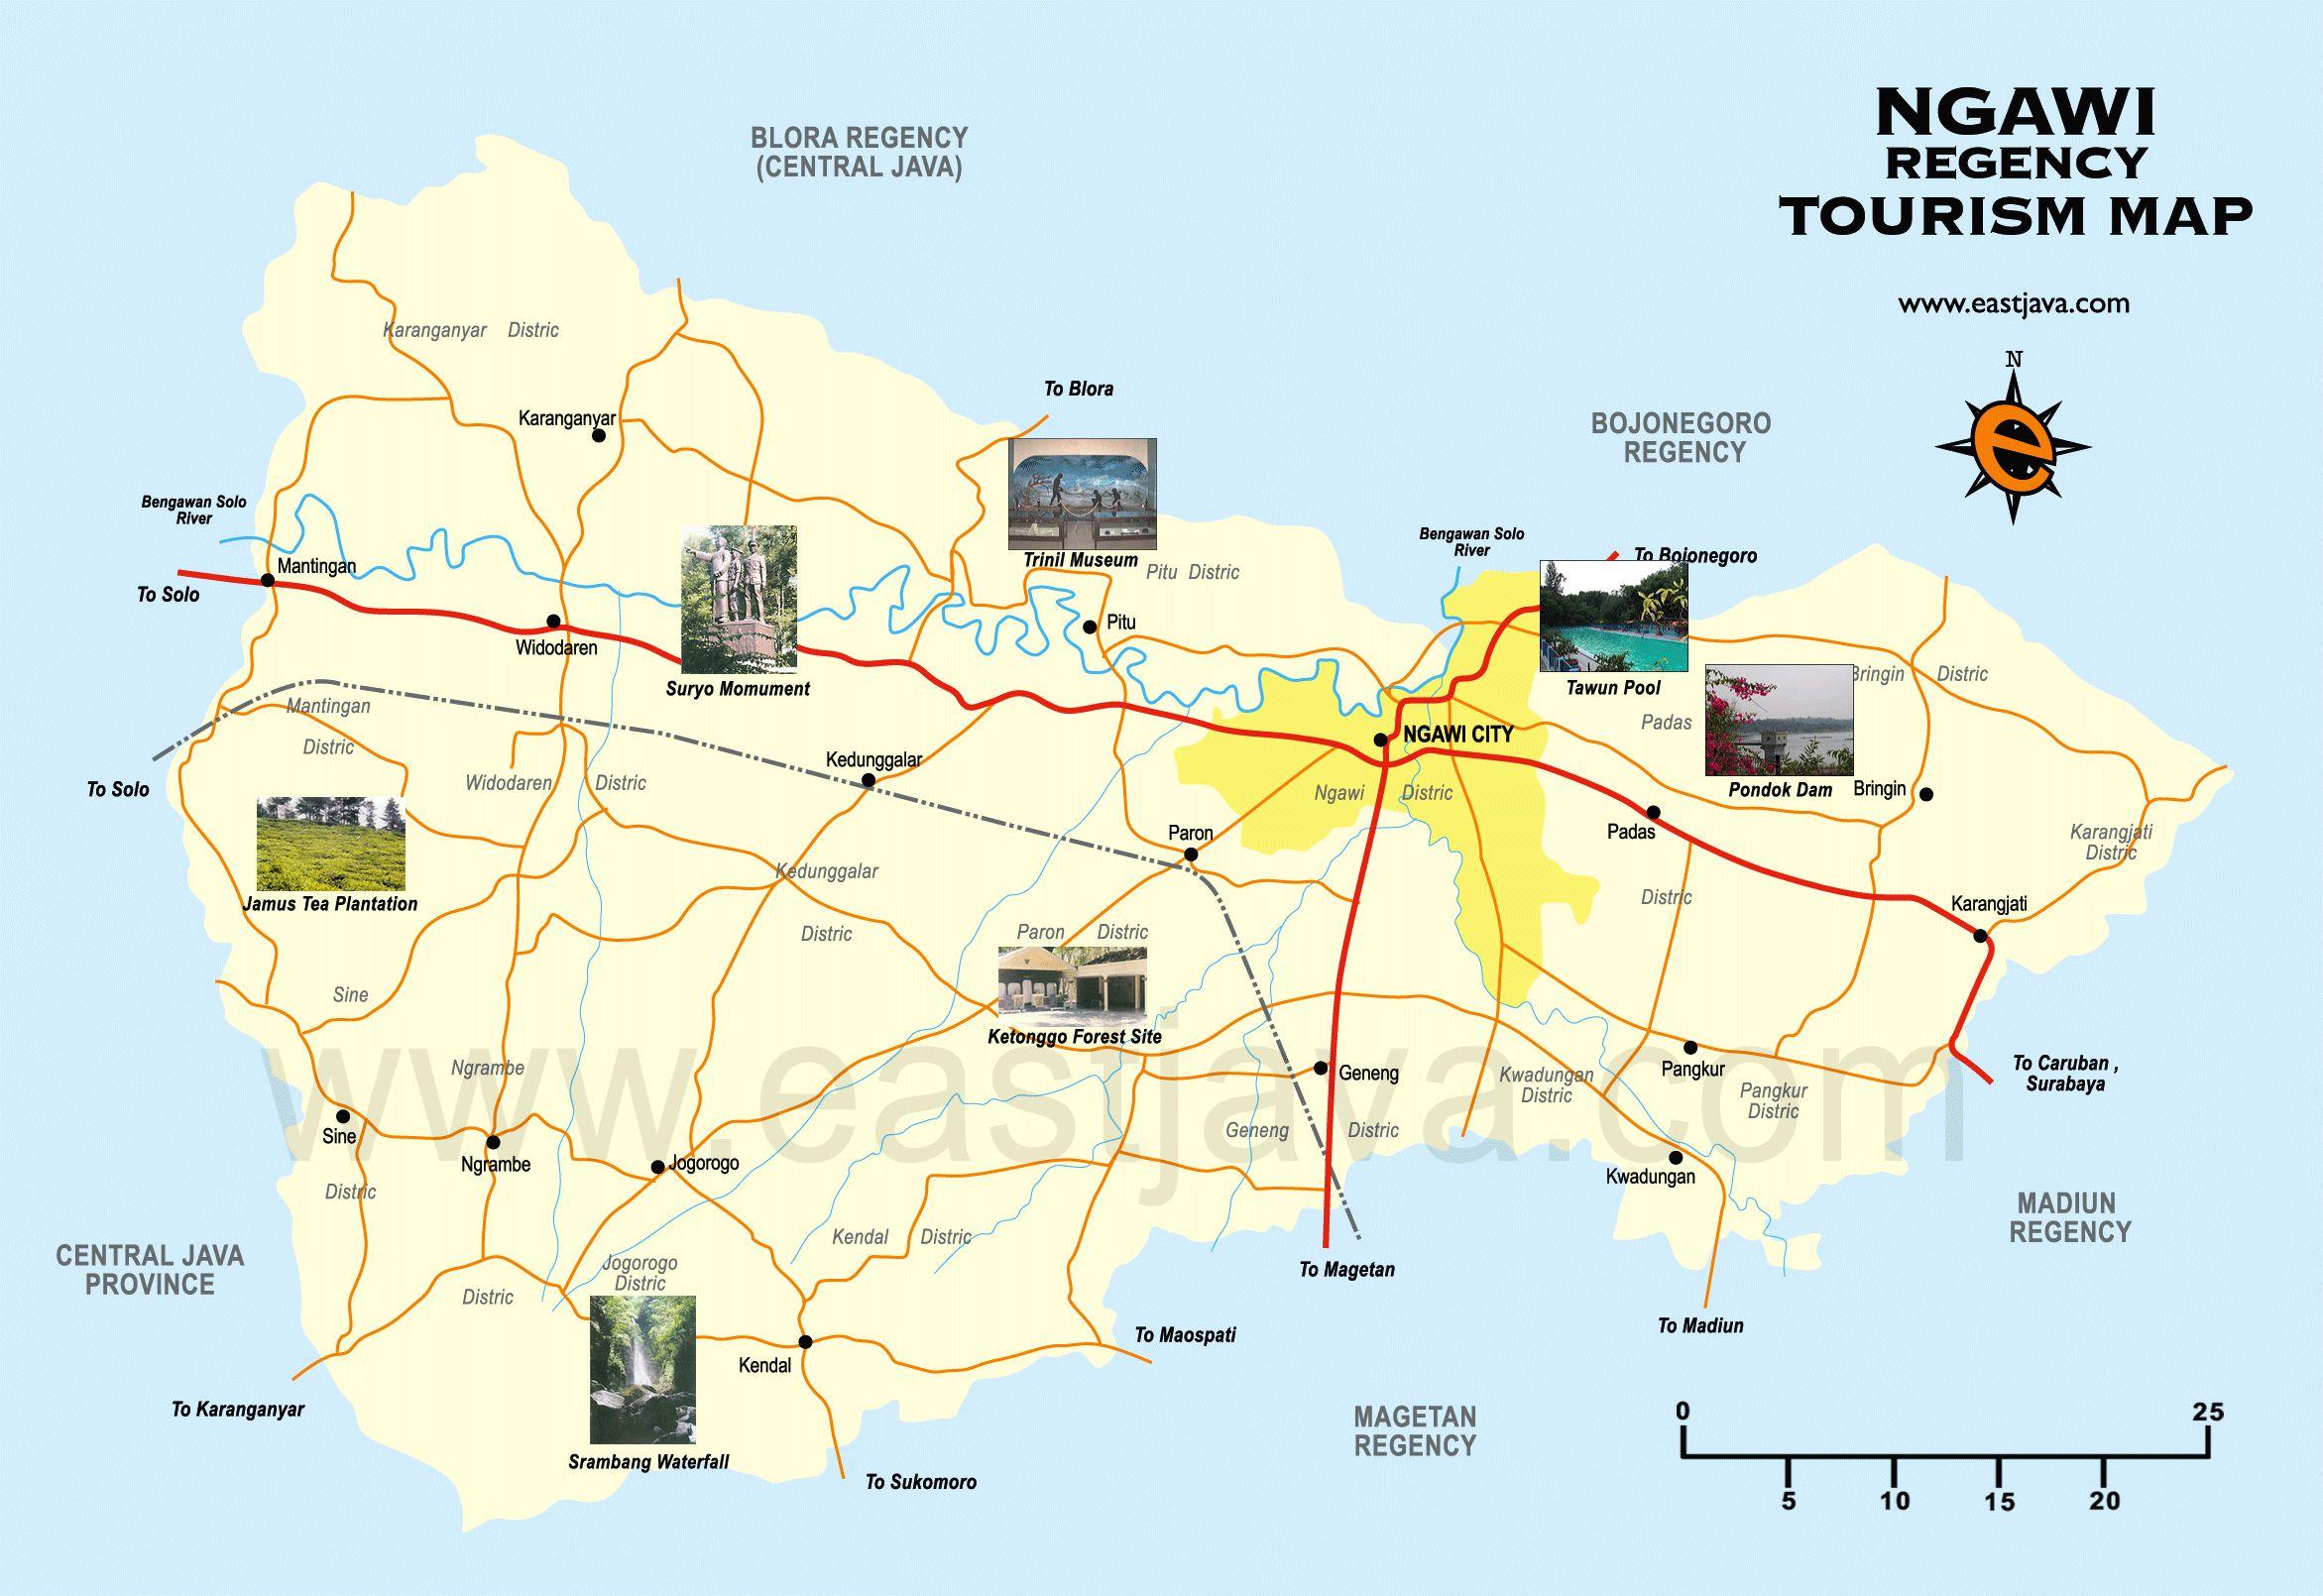 Kumpulan Tempat Wisata Ngawi Jawa Timur Gambar Peta Lengkap Terbaru